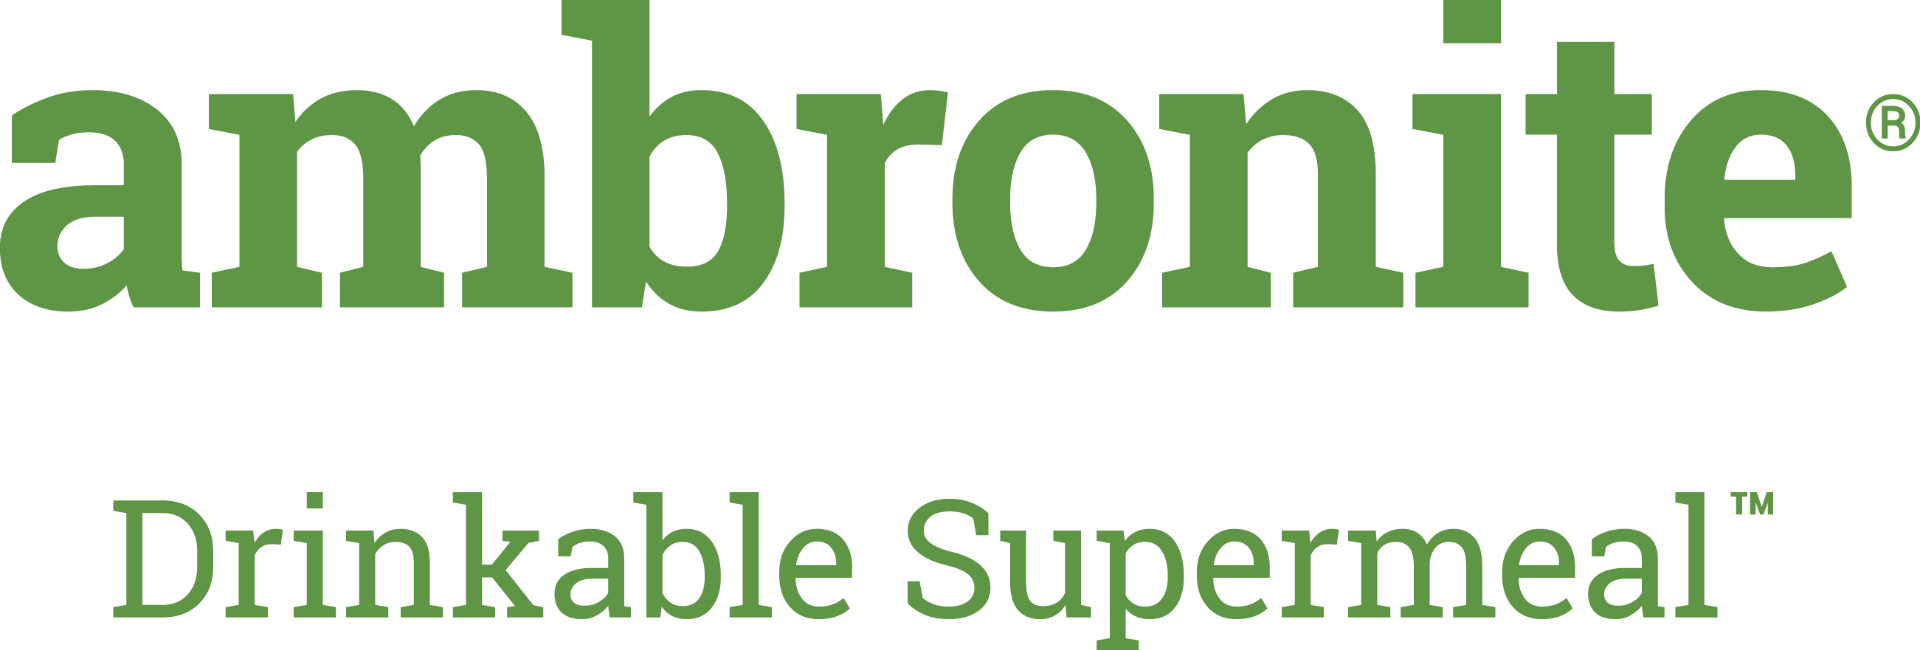 Ambronite Drinkable Supermeal Logo